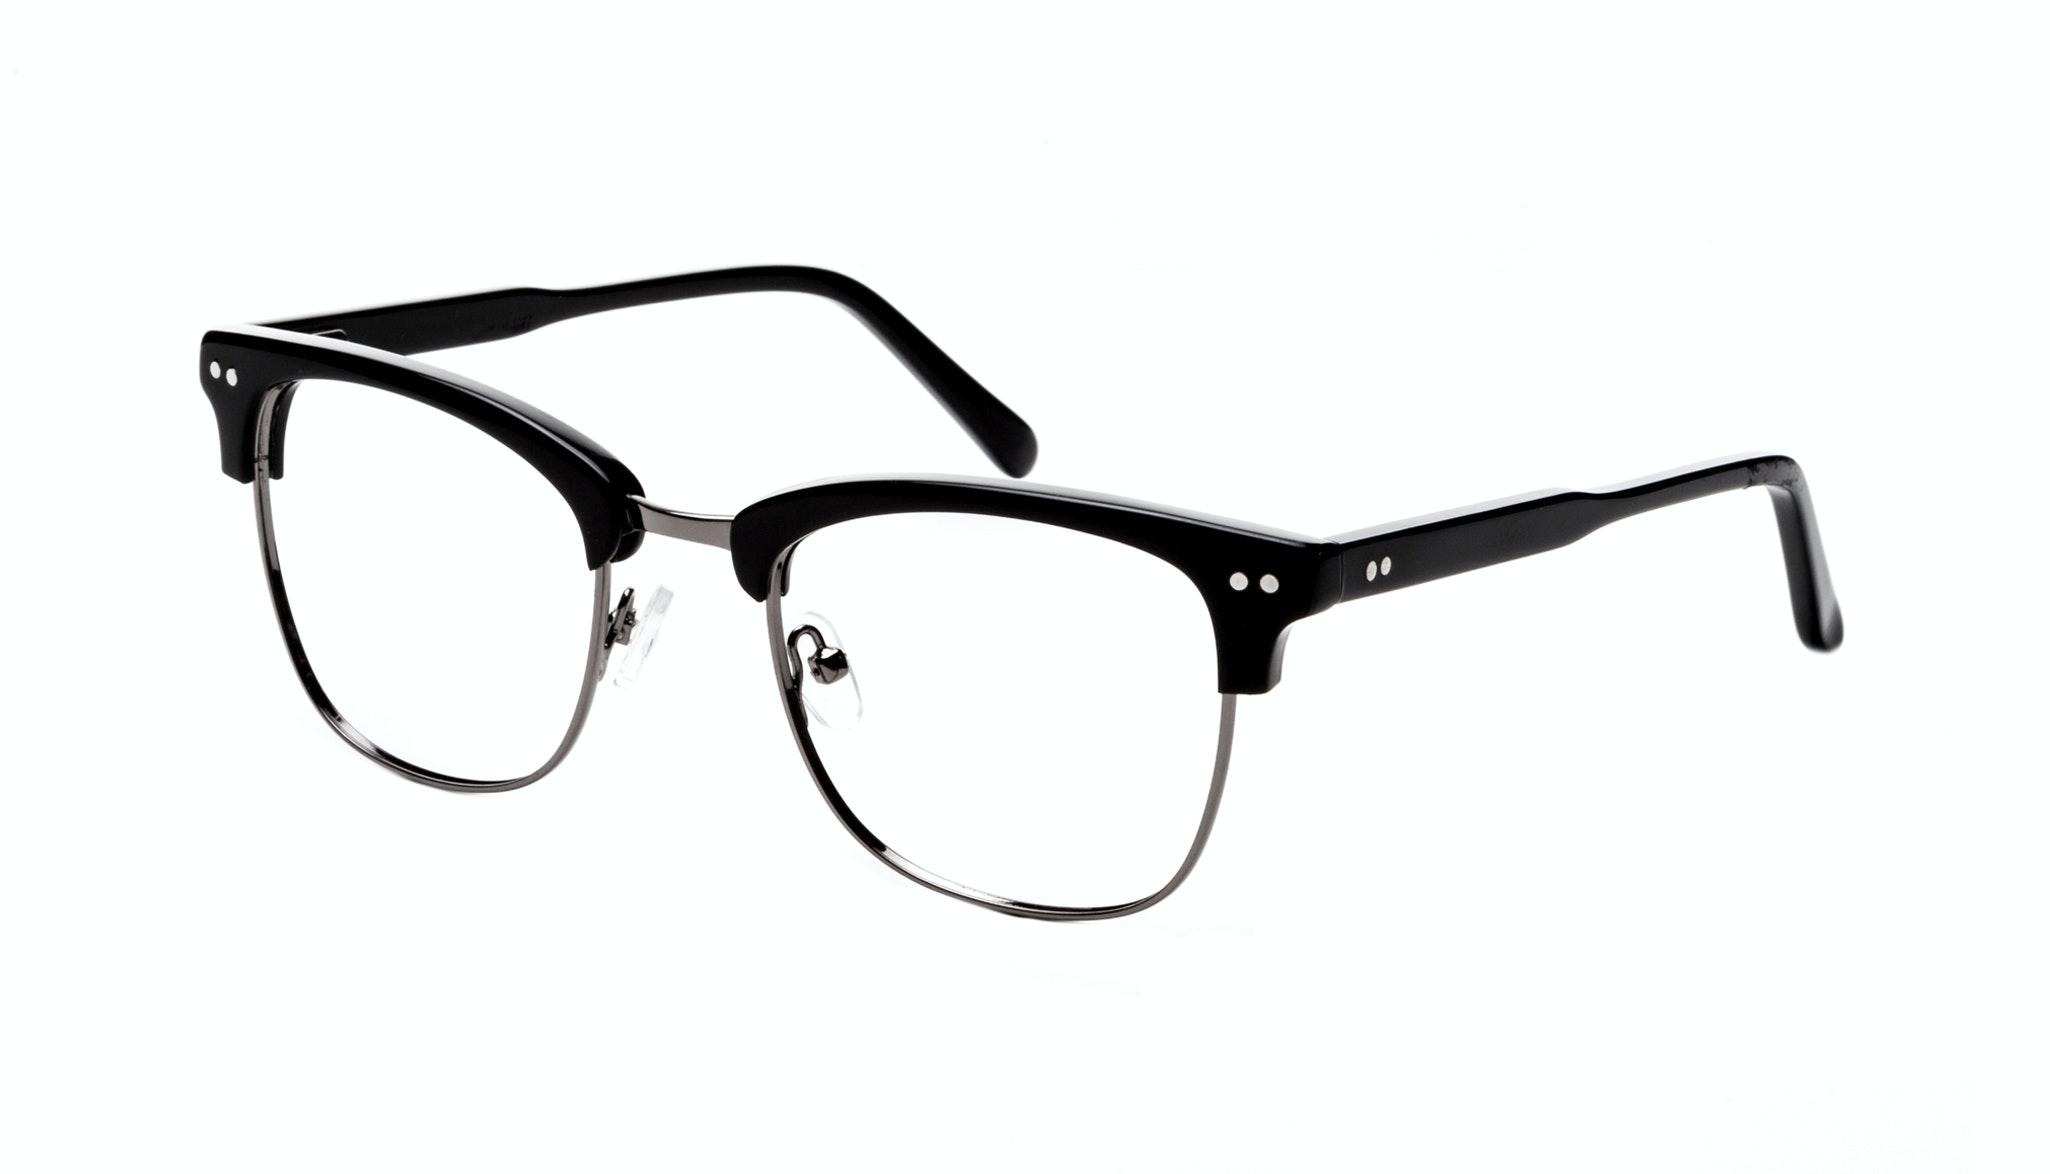 Affordable Fashion Glasses Square Eyeglasses Men Lift Onyx Tilt